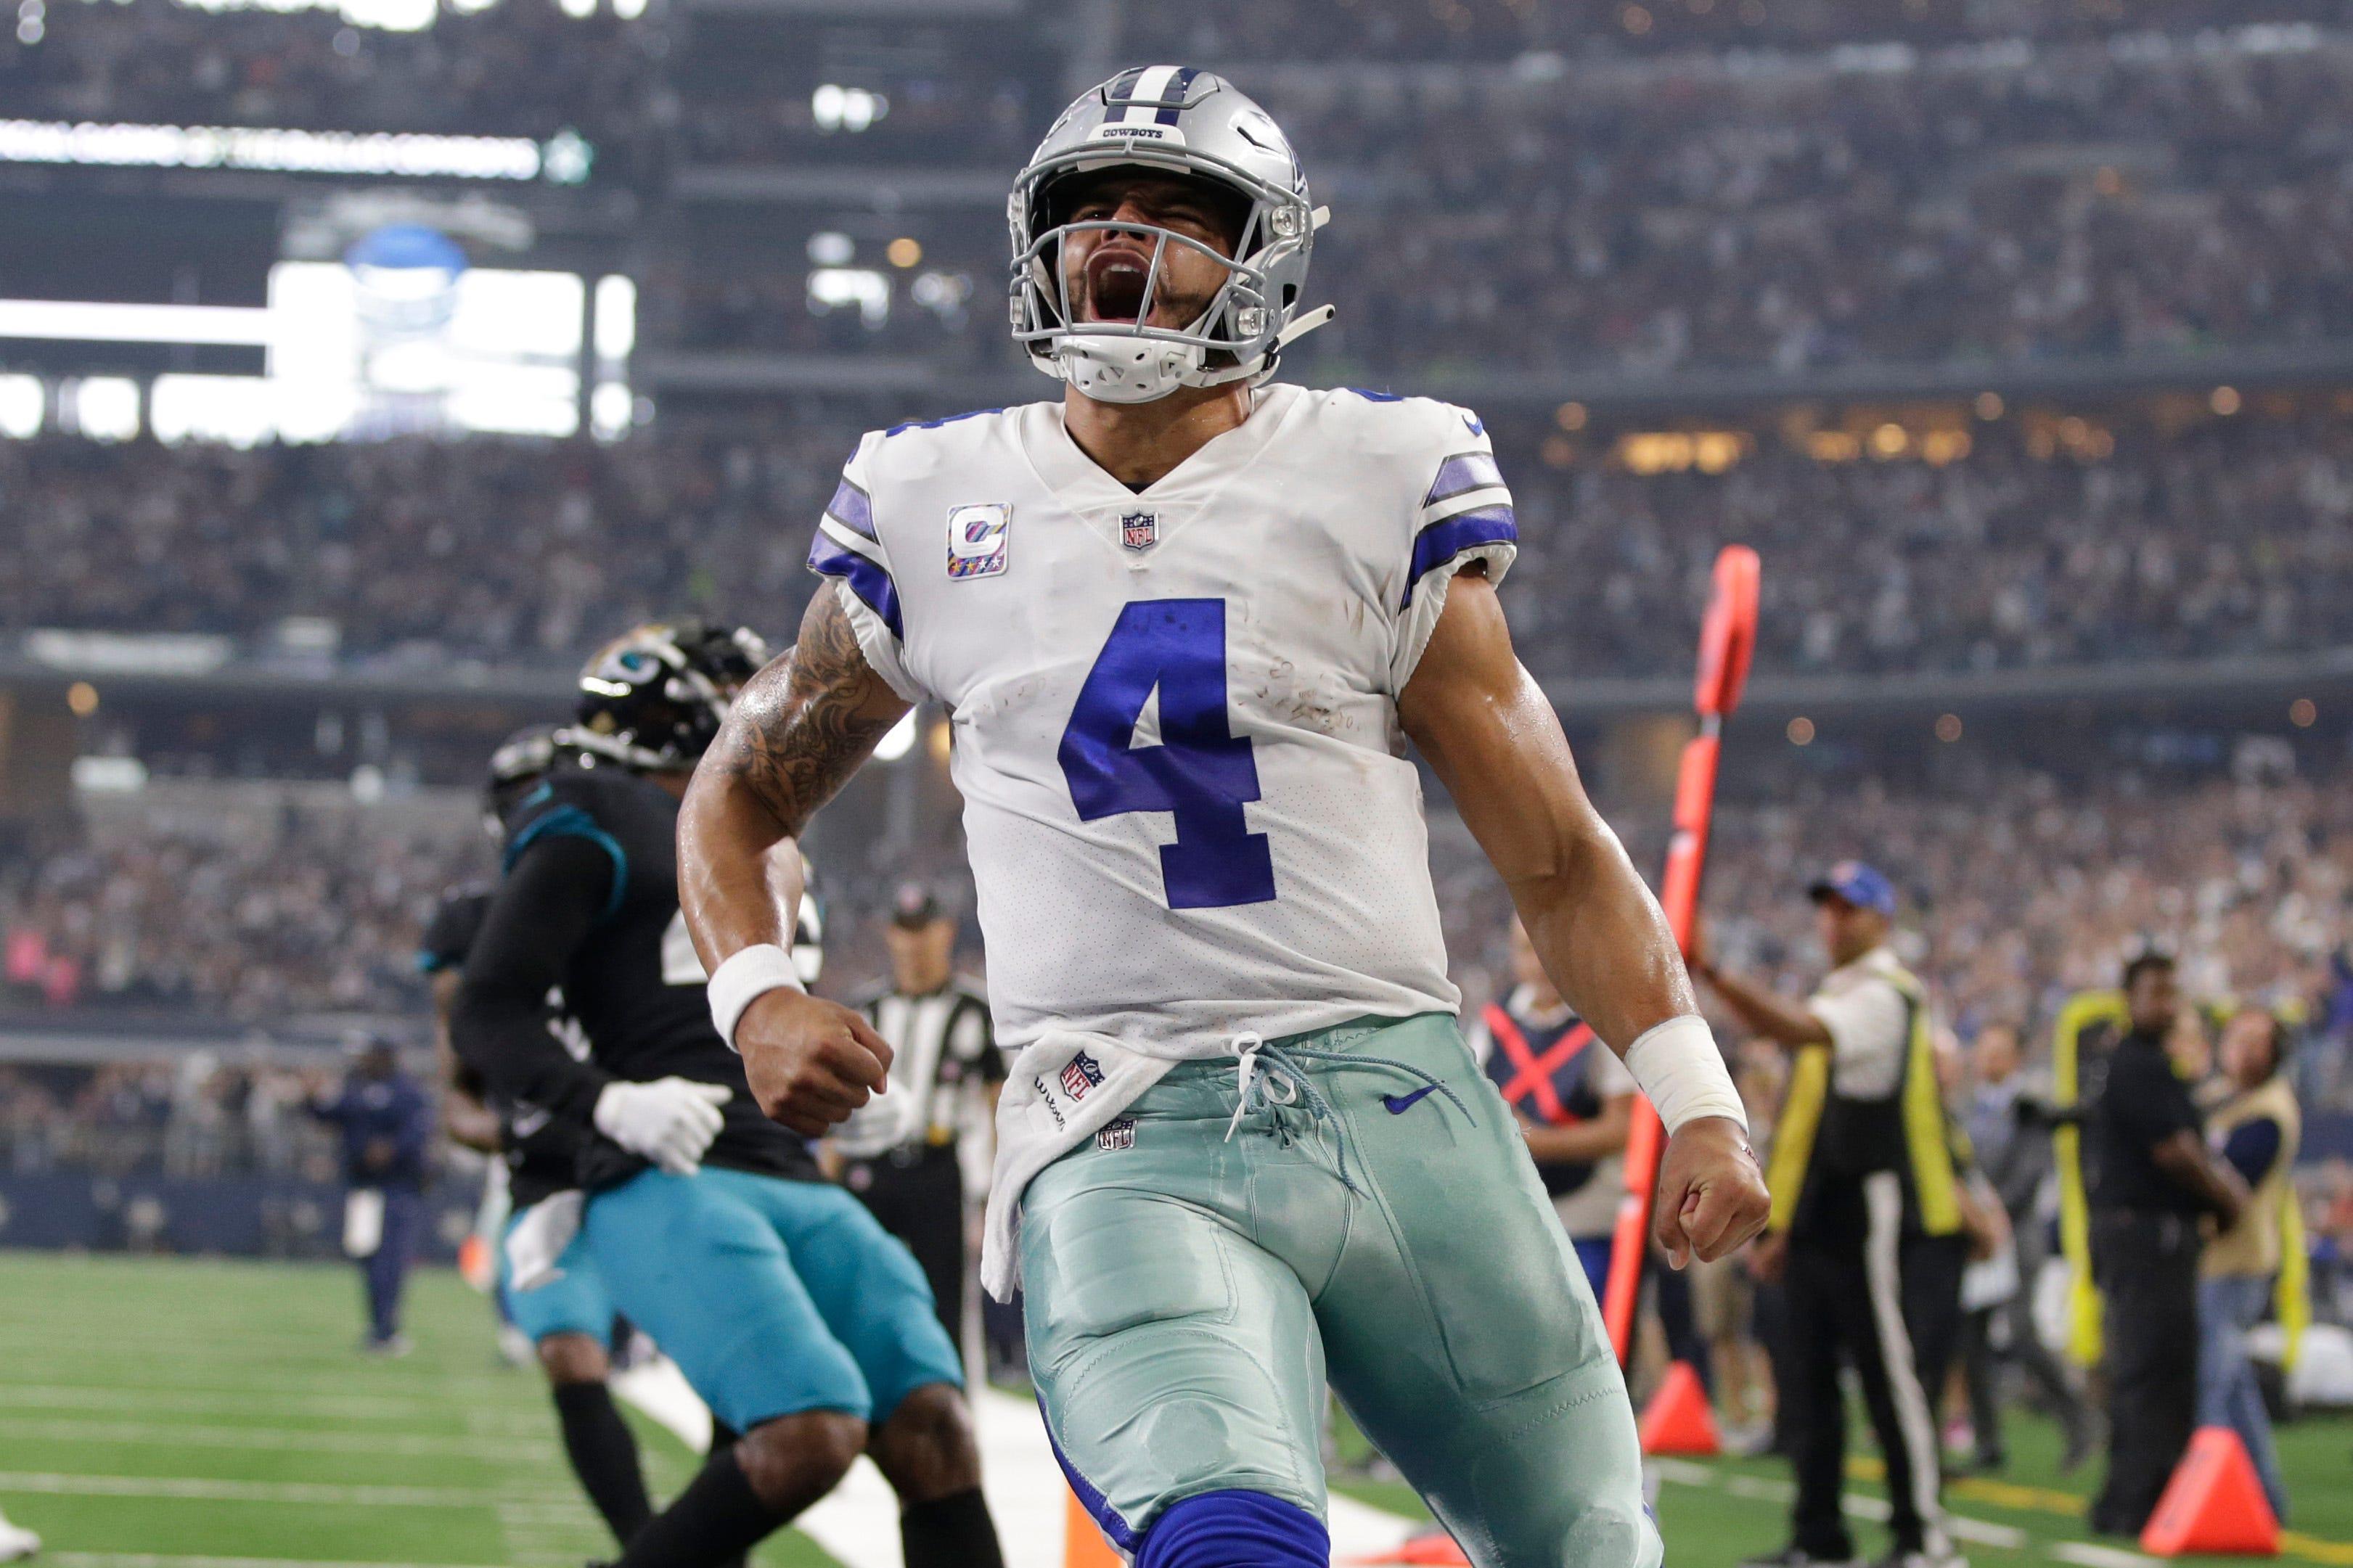 Nfl Jacksonville Jaguars At Dallas Cowboys